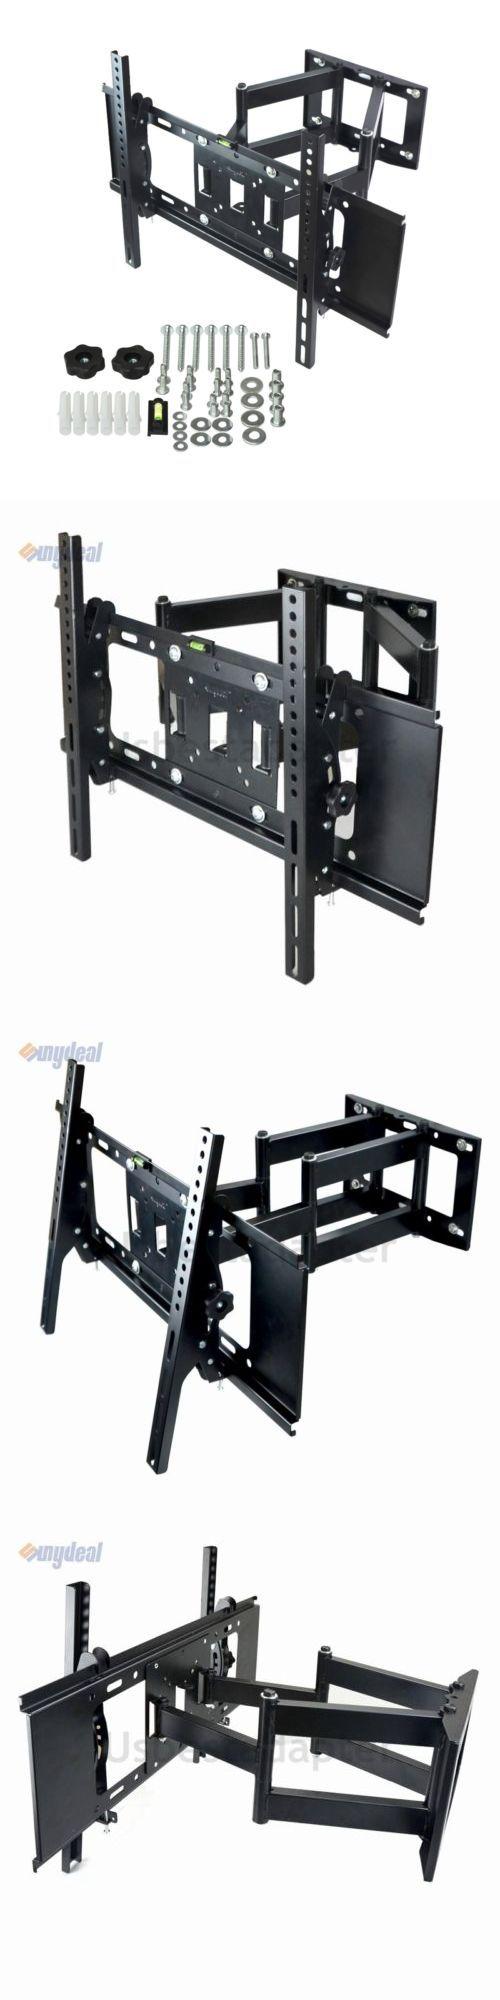 TV Mounts and Brackets: Dual Arm Full Motion Tilt Lcd Led Tv Wall Mount Bracket 36 42 46 50 55 60 65 70 -> BUY IT NOW ONLY: $30.22 on eBay!